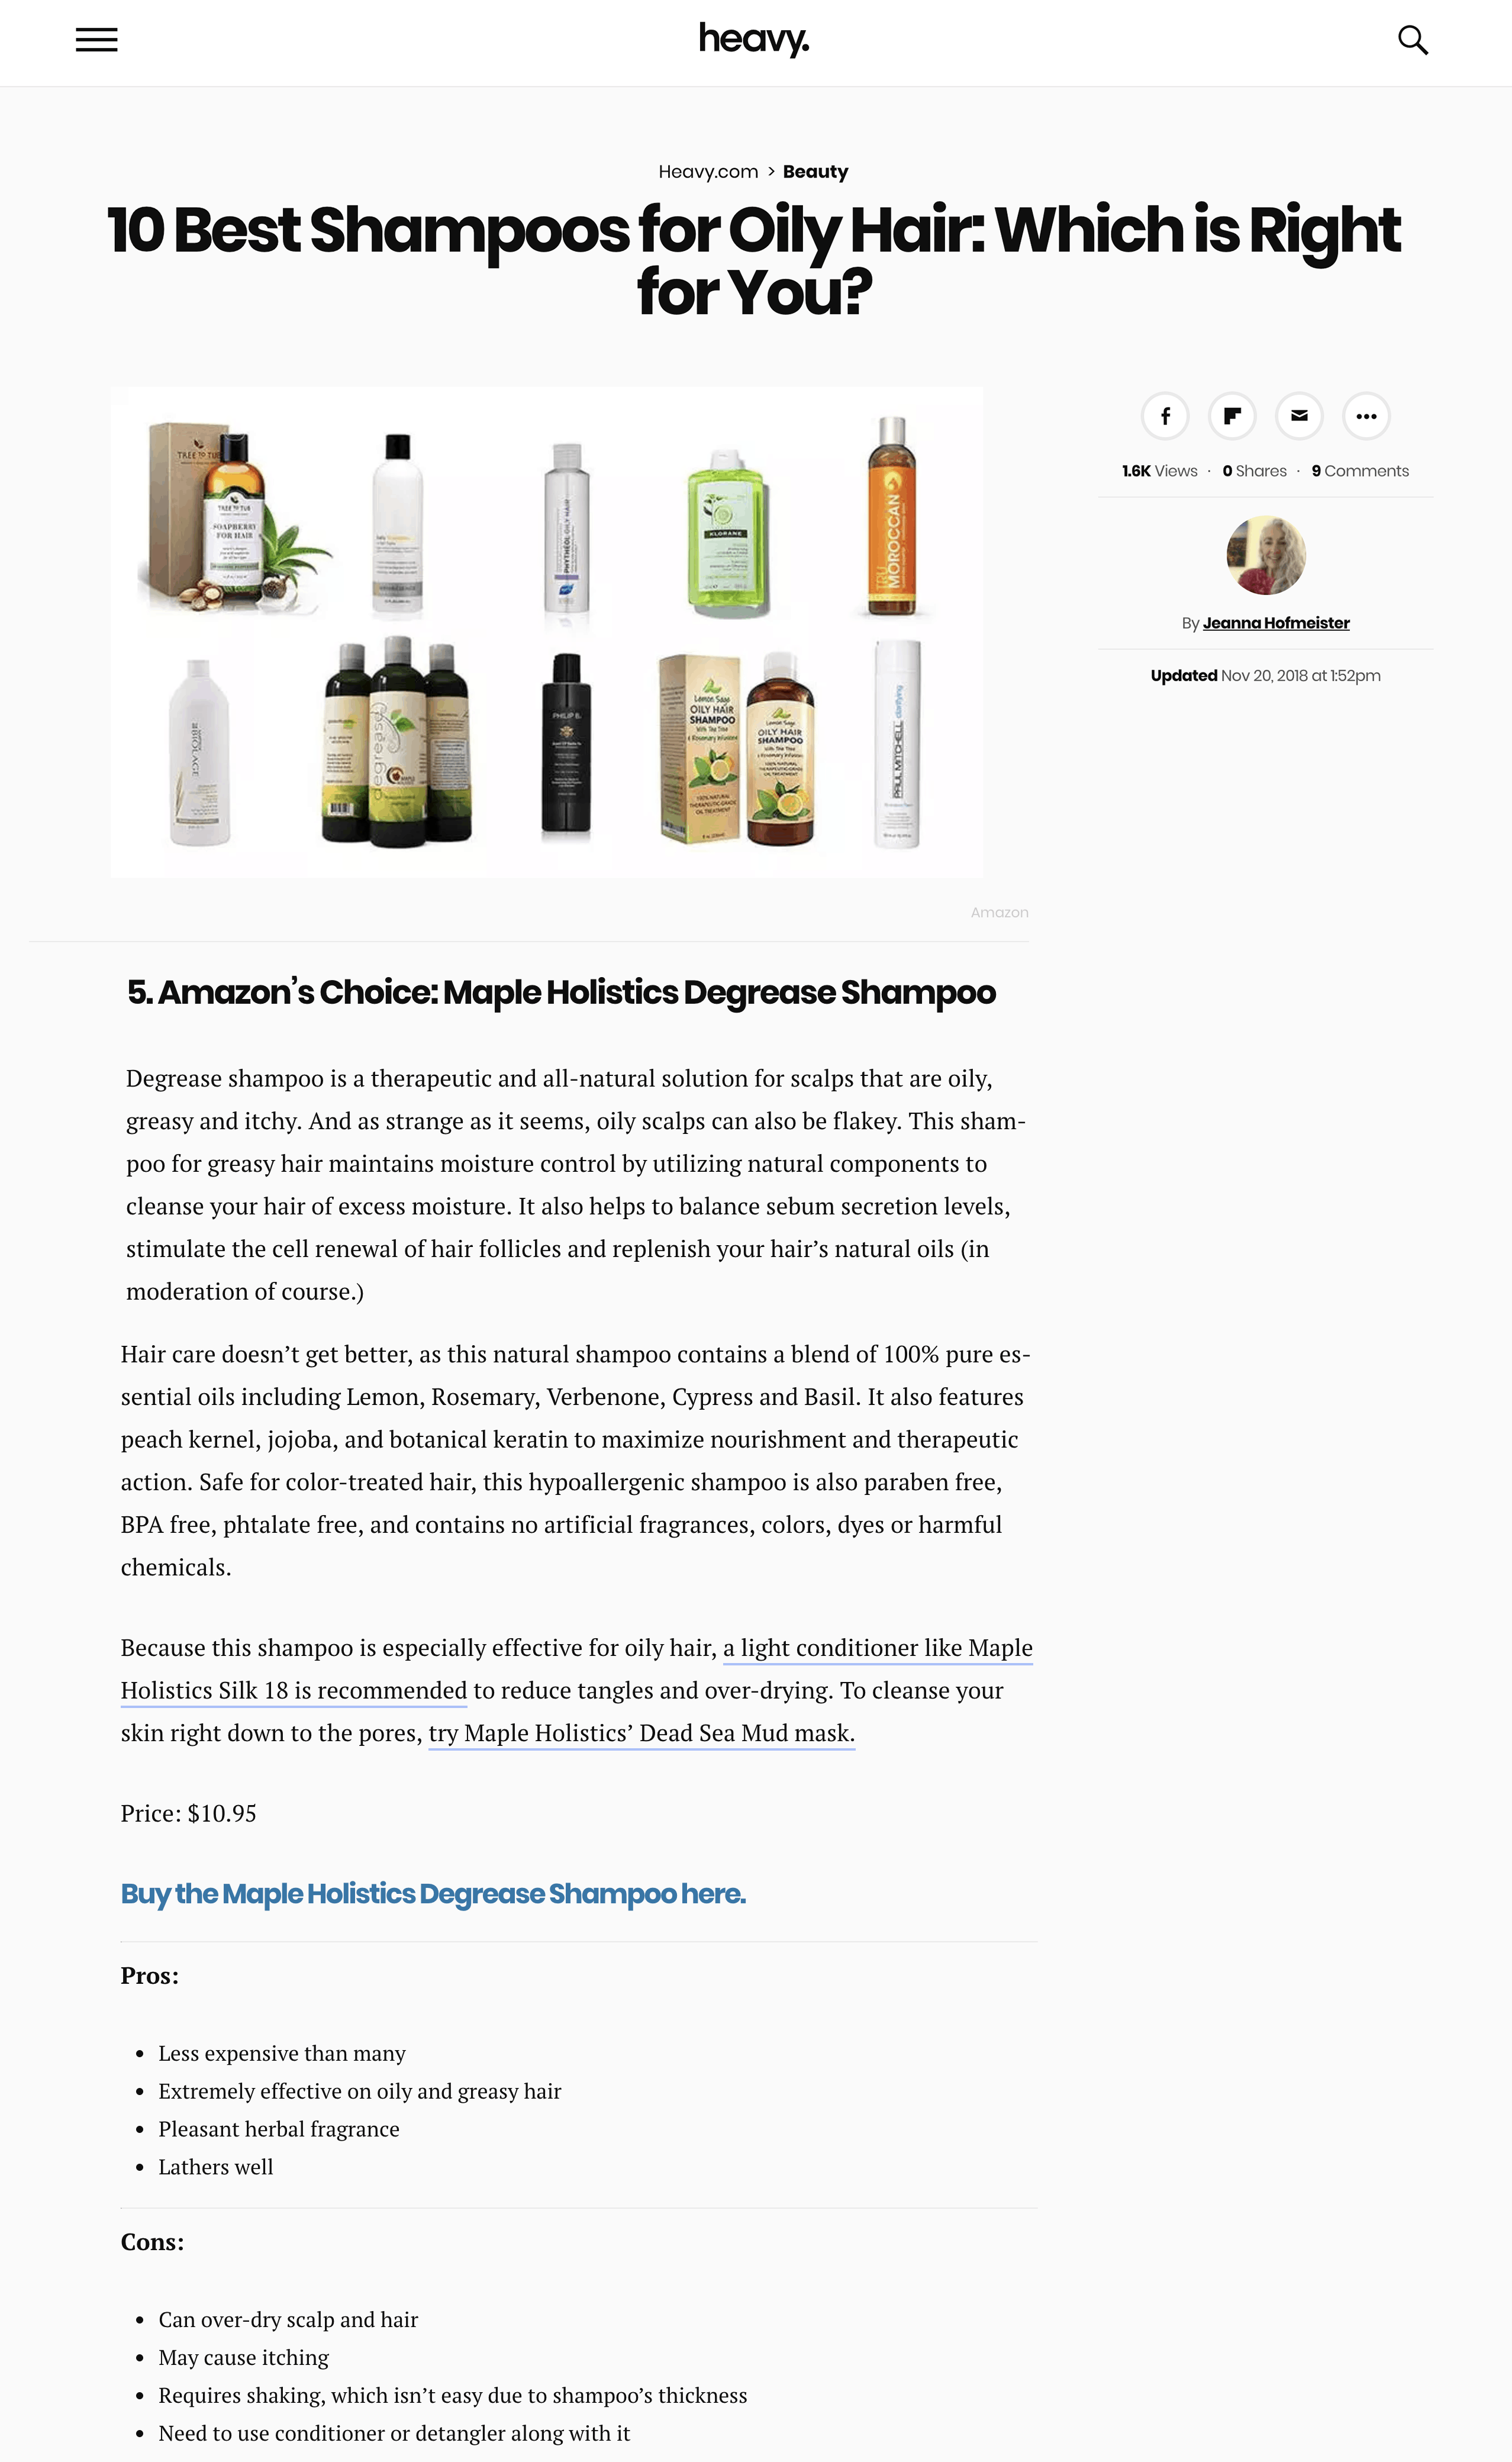 best shampoos list